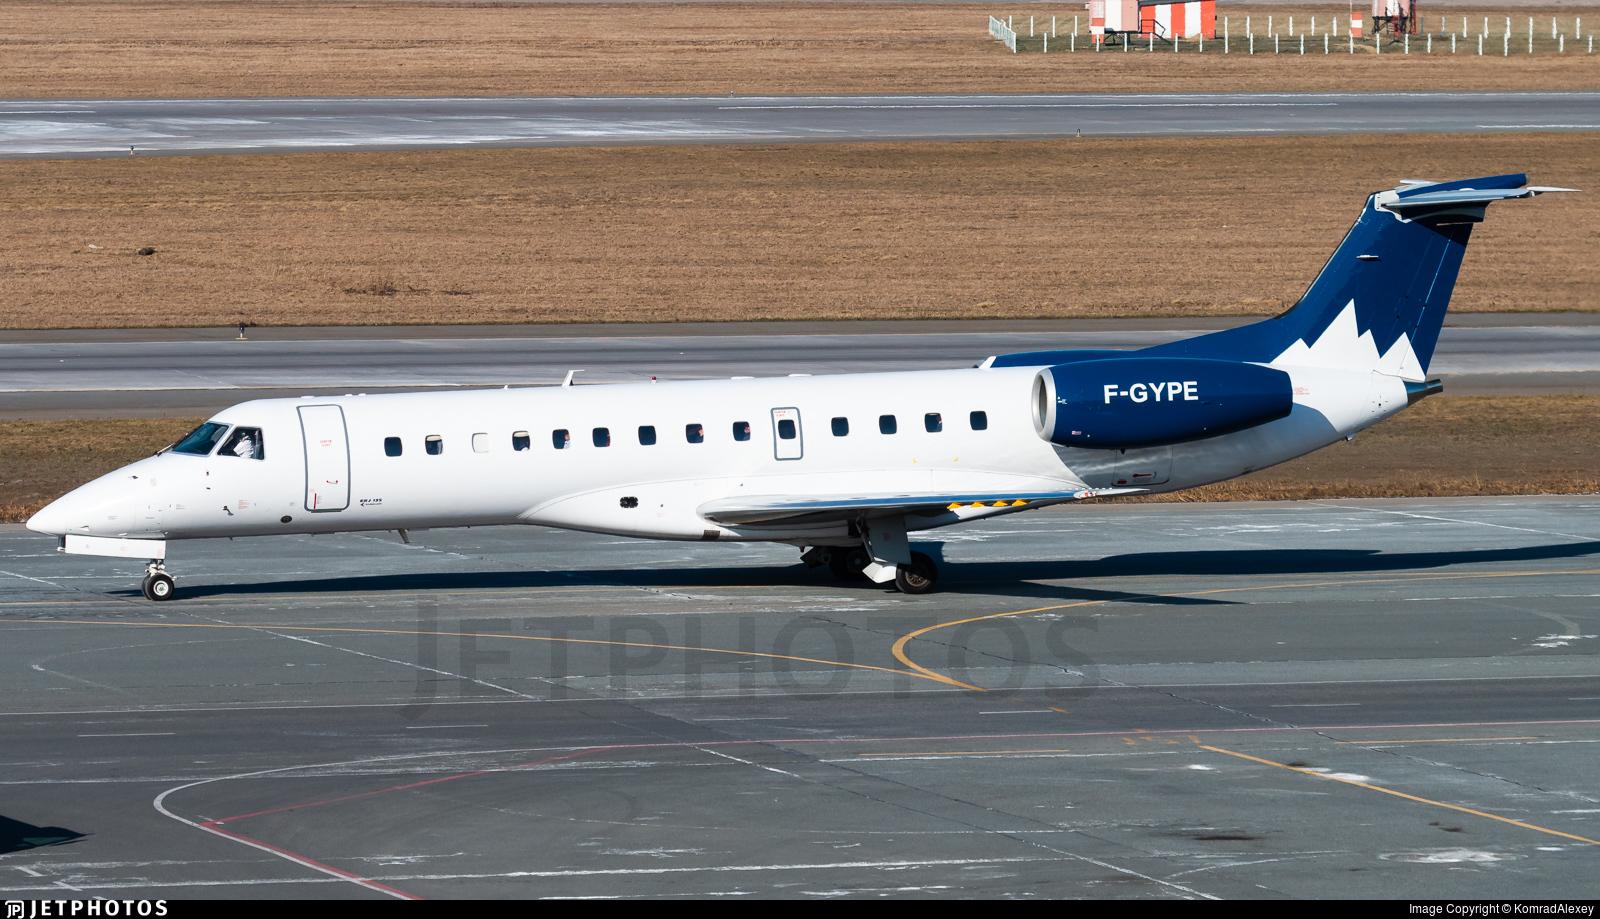 F-GYPE - Embraer ERJ-135LR - Pan Europeene Air Service